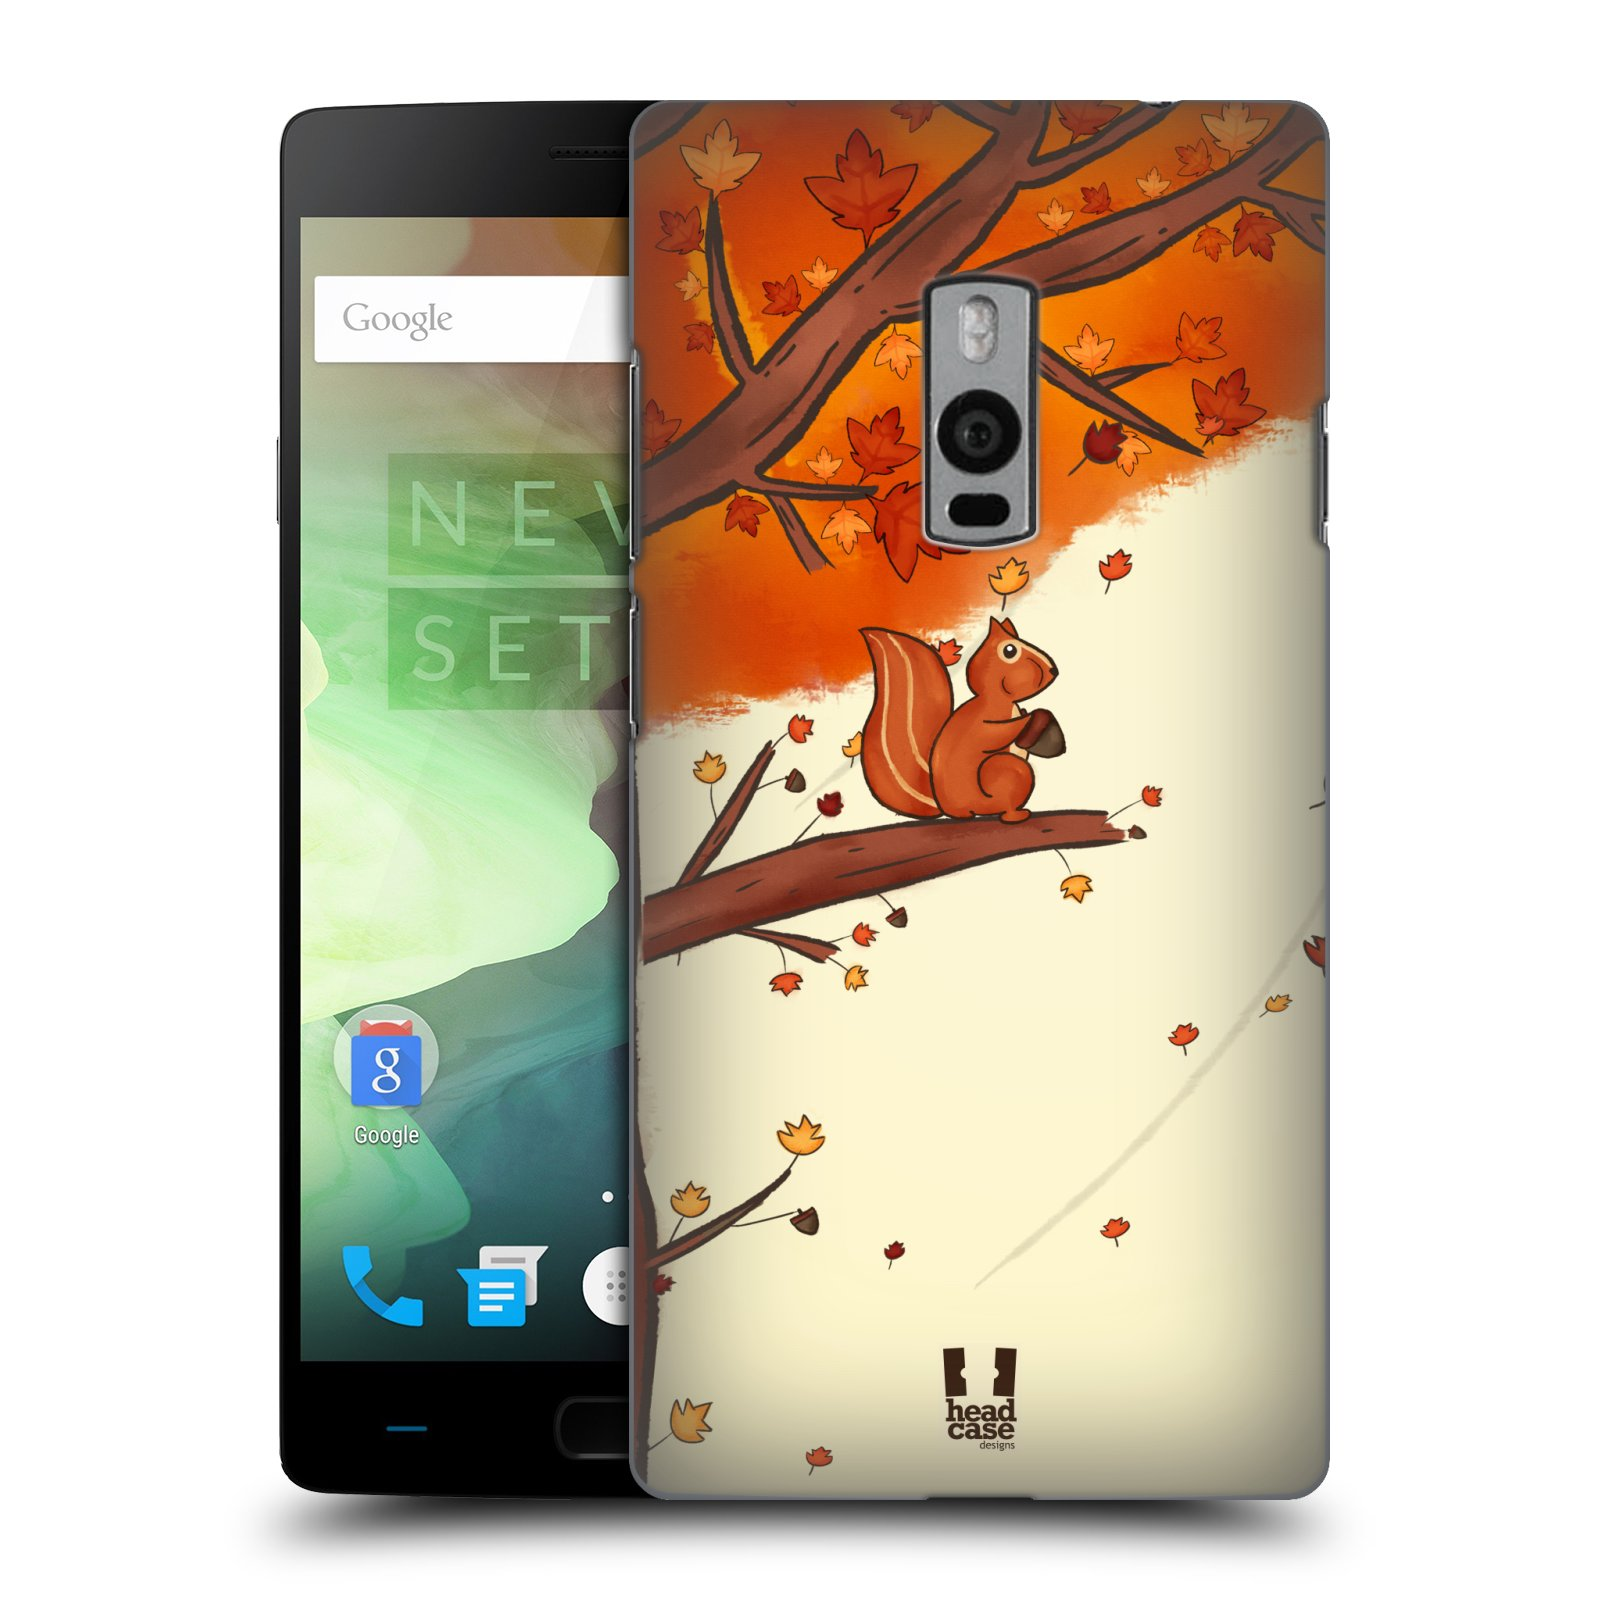 HEAD CASE pevný plastový obal na mobil OnePlus 2  ( TWO ) vzor podzimní zvířátka veverka